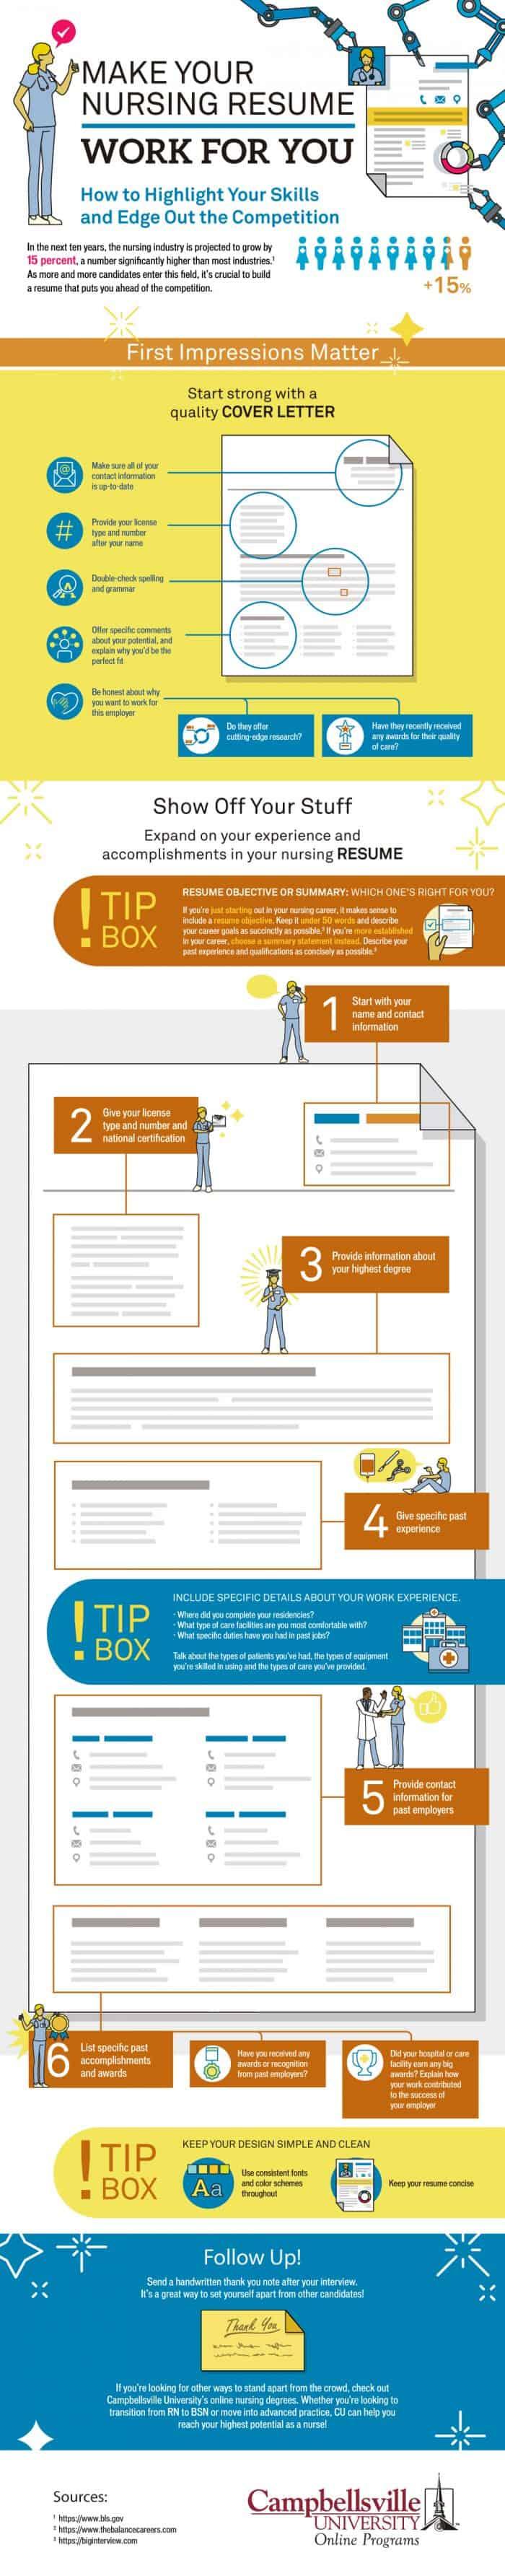 Nursing Resume Infographic